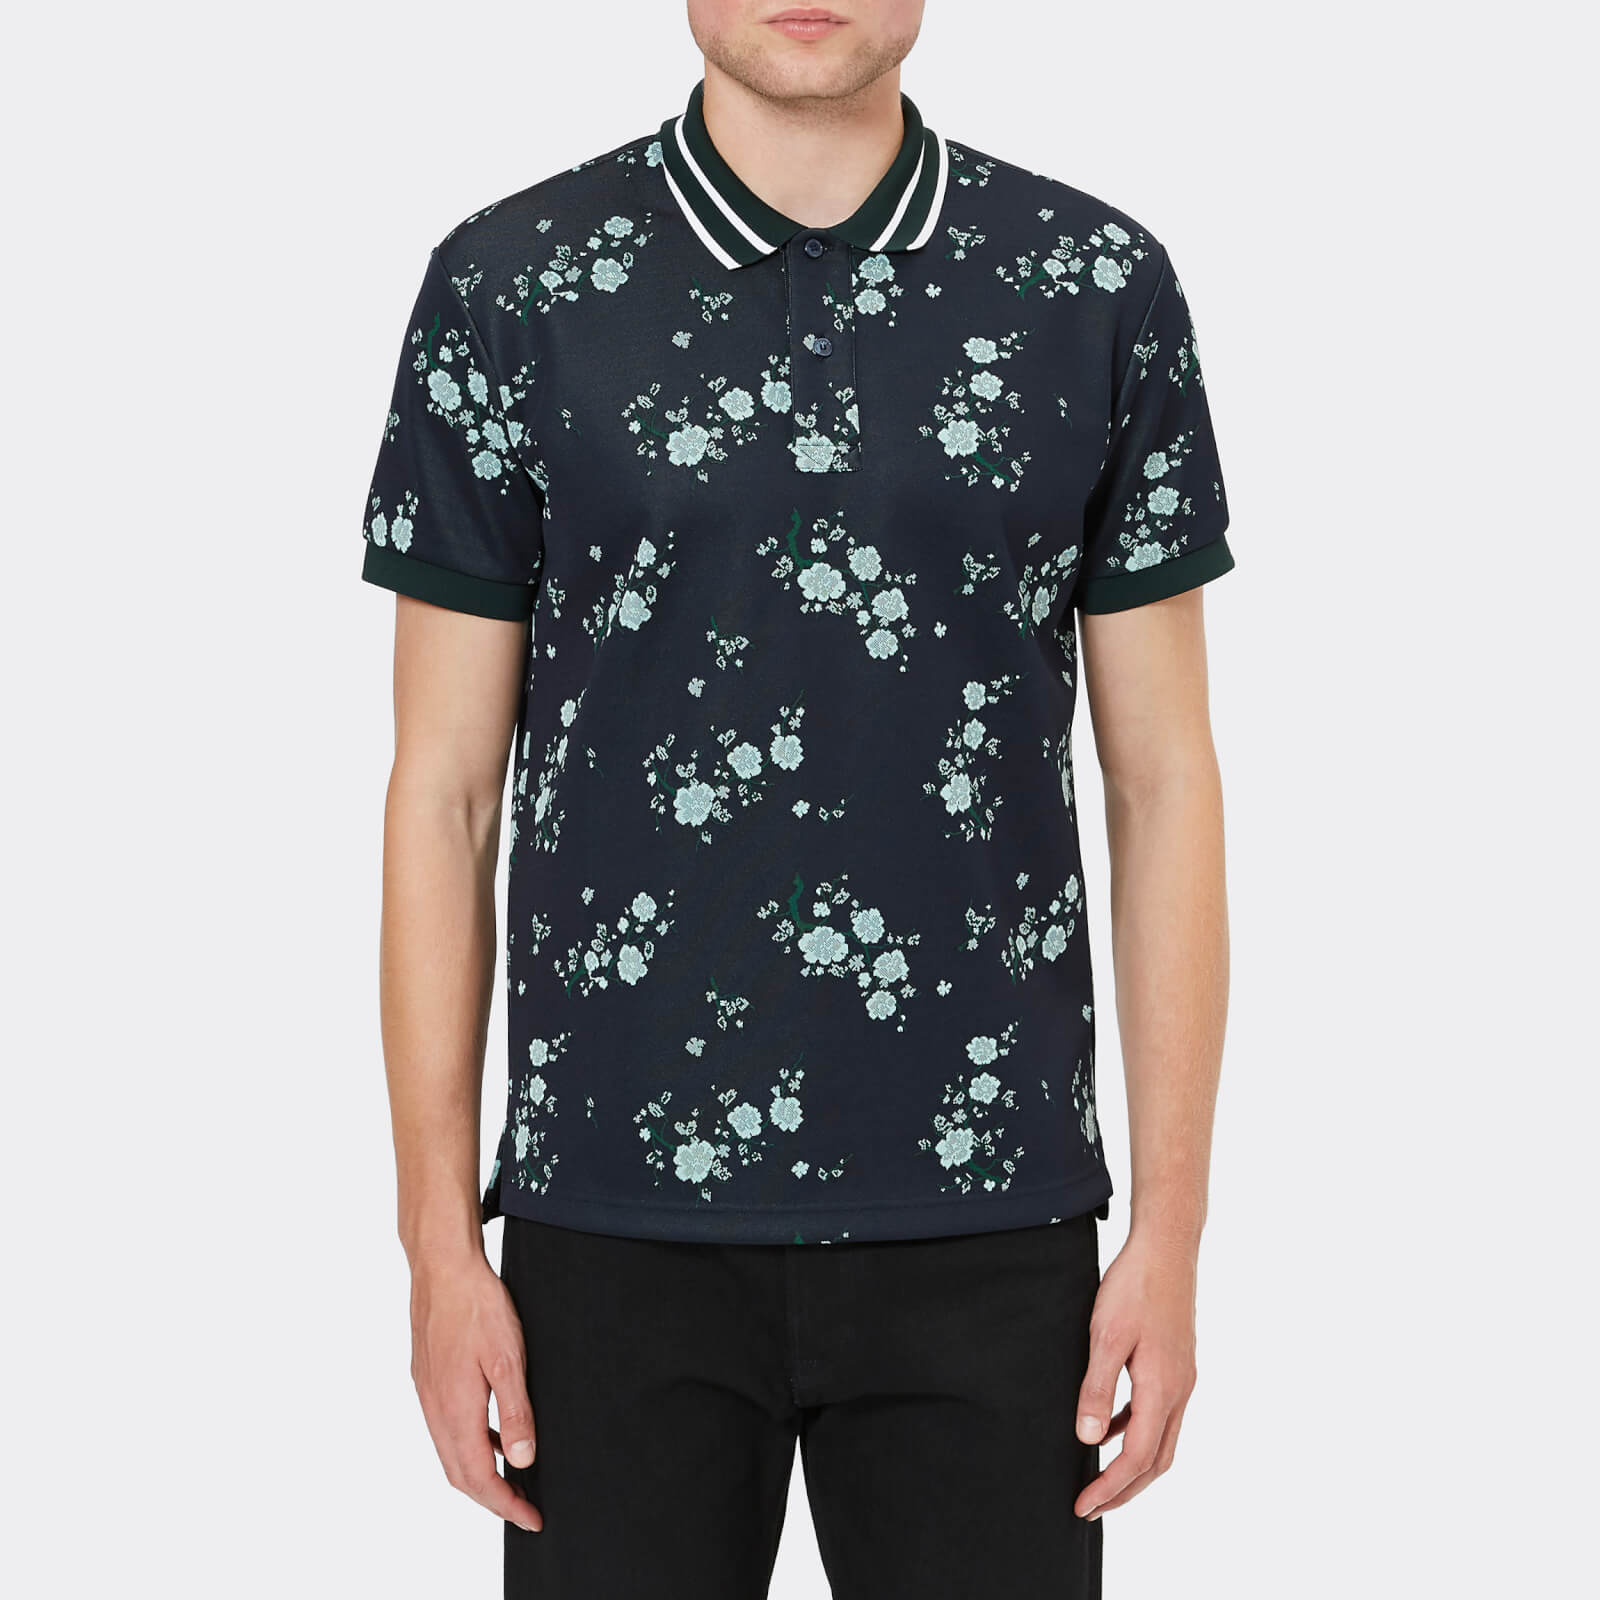 b64854e746 KENZO Men's Floral Polo Shirt - Navy Blue